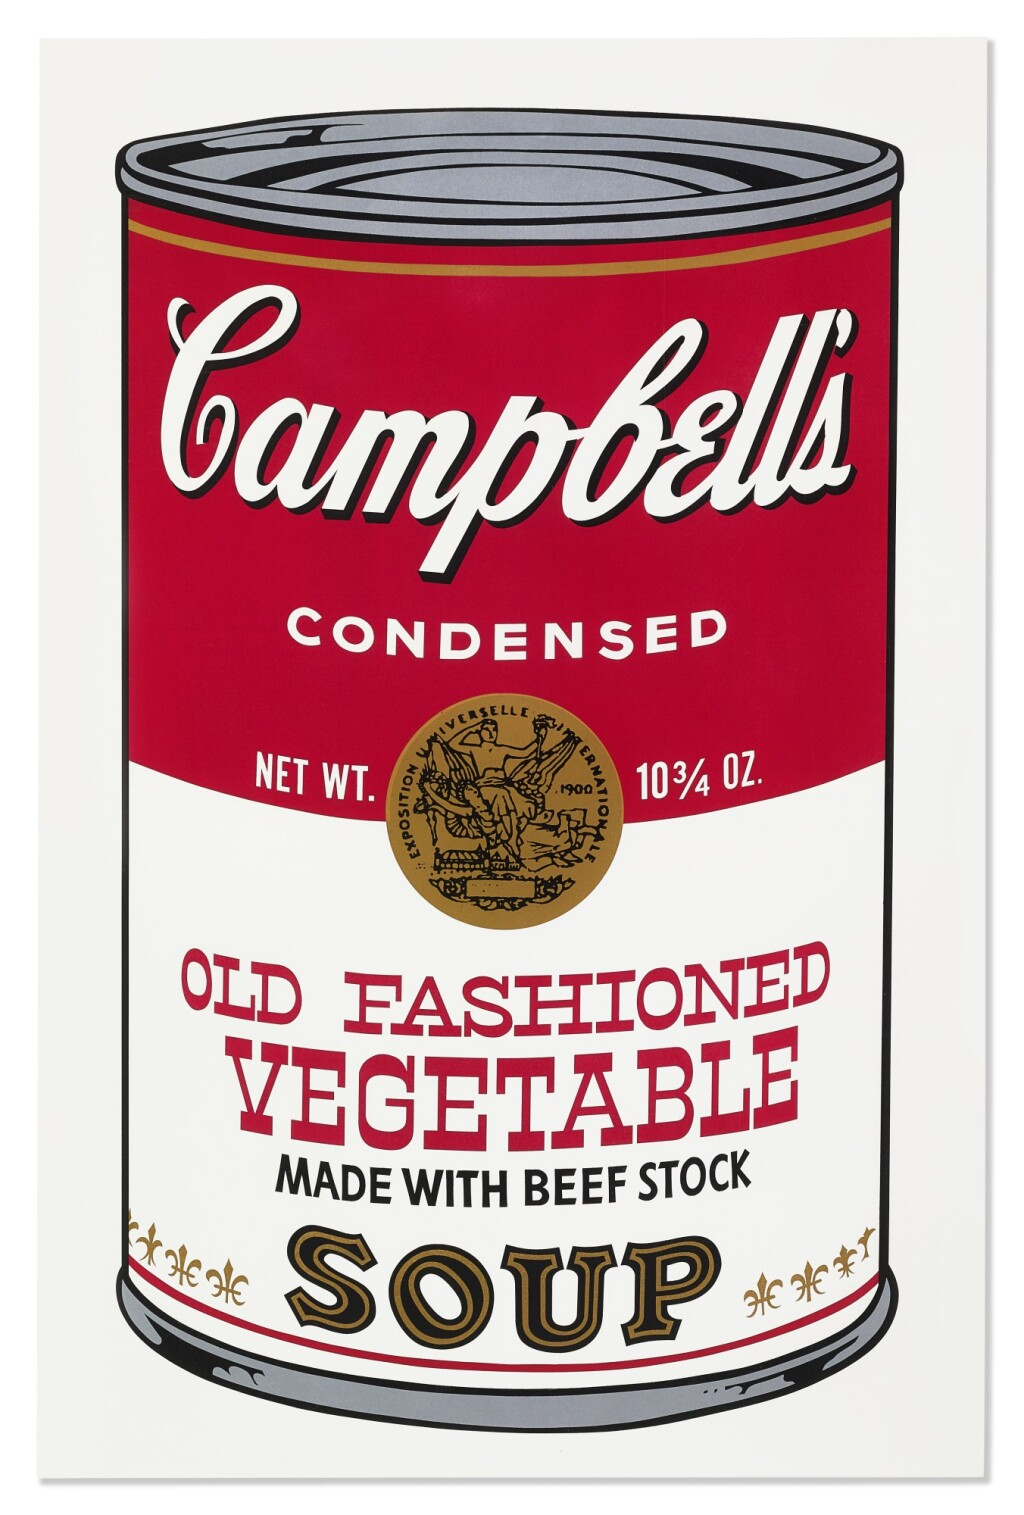 ANDY WARHOL 安迪·沃荷 | CAMPBELL'S SOUP II: OLD FASHIONED VEGETABLE (II.54) 金寶濃湯 II:傳統蔬菜(II.54)